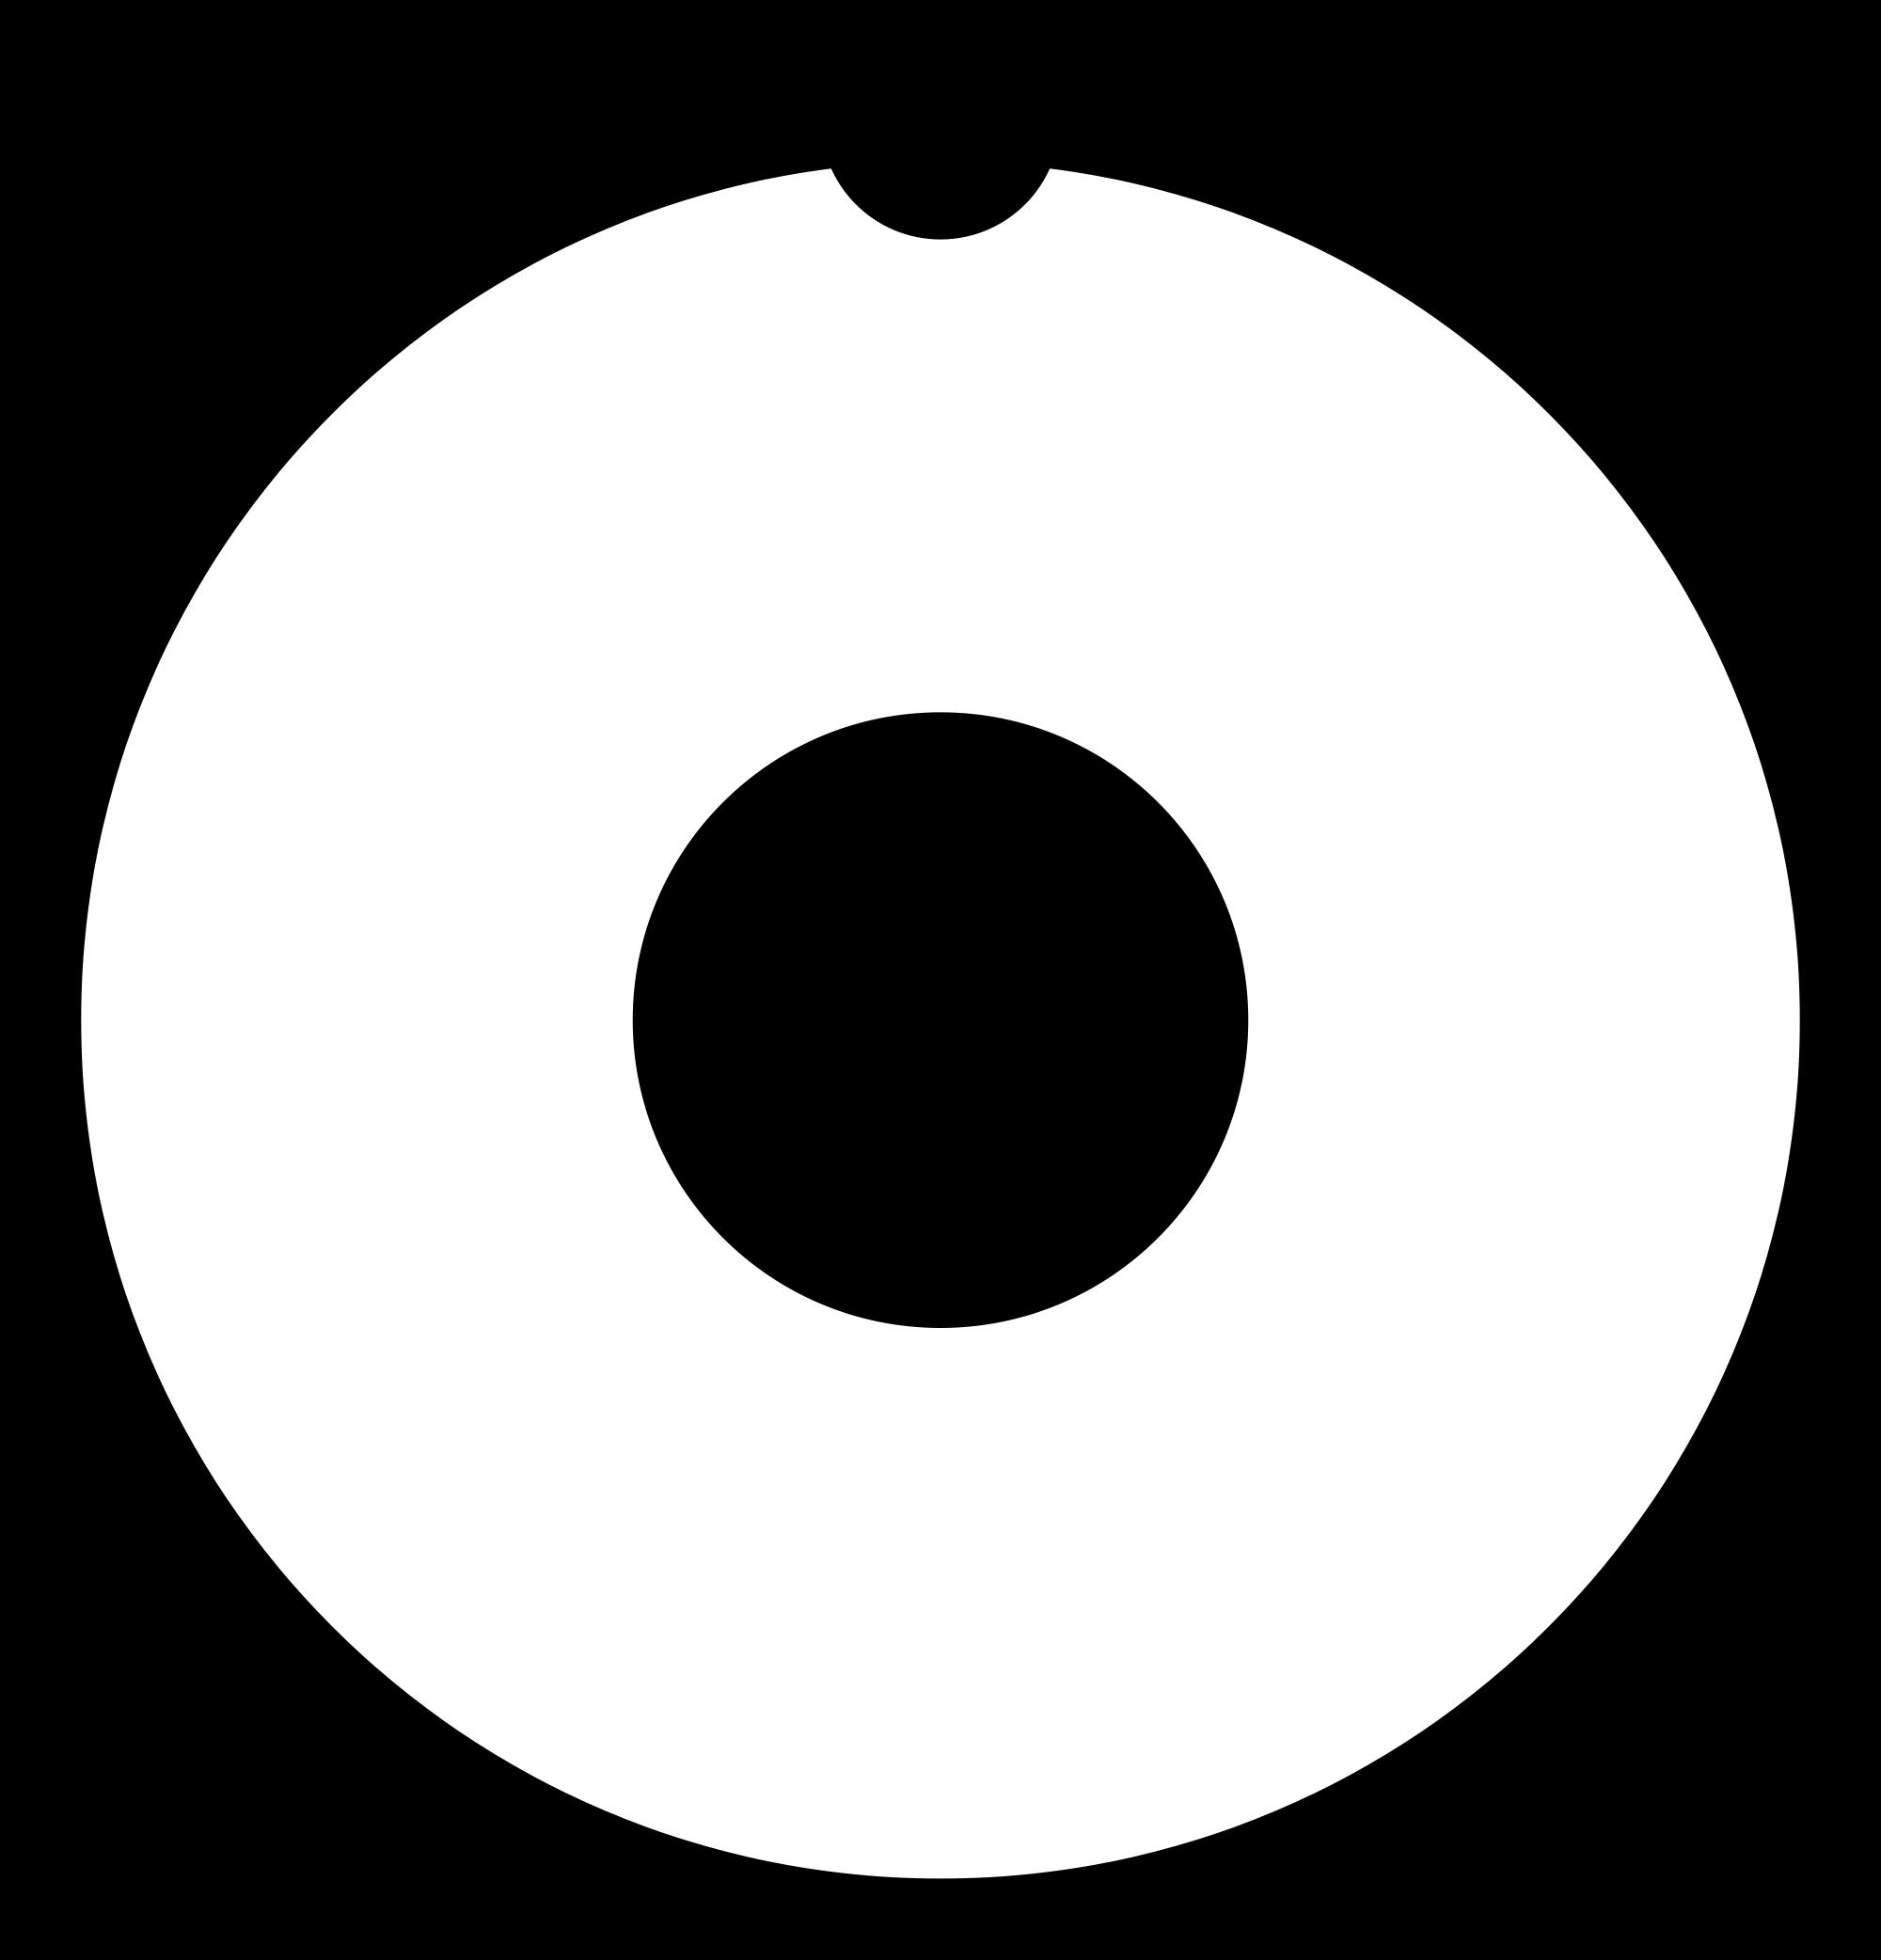 Atom clipart hydrogen atom. File dr manhattan symbol